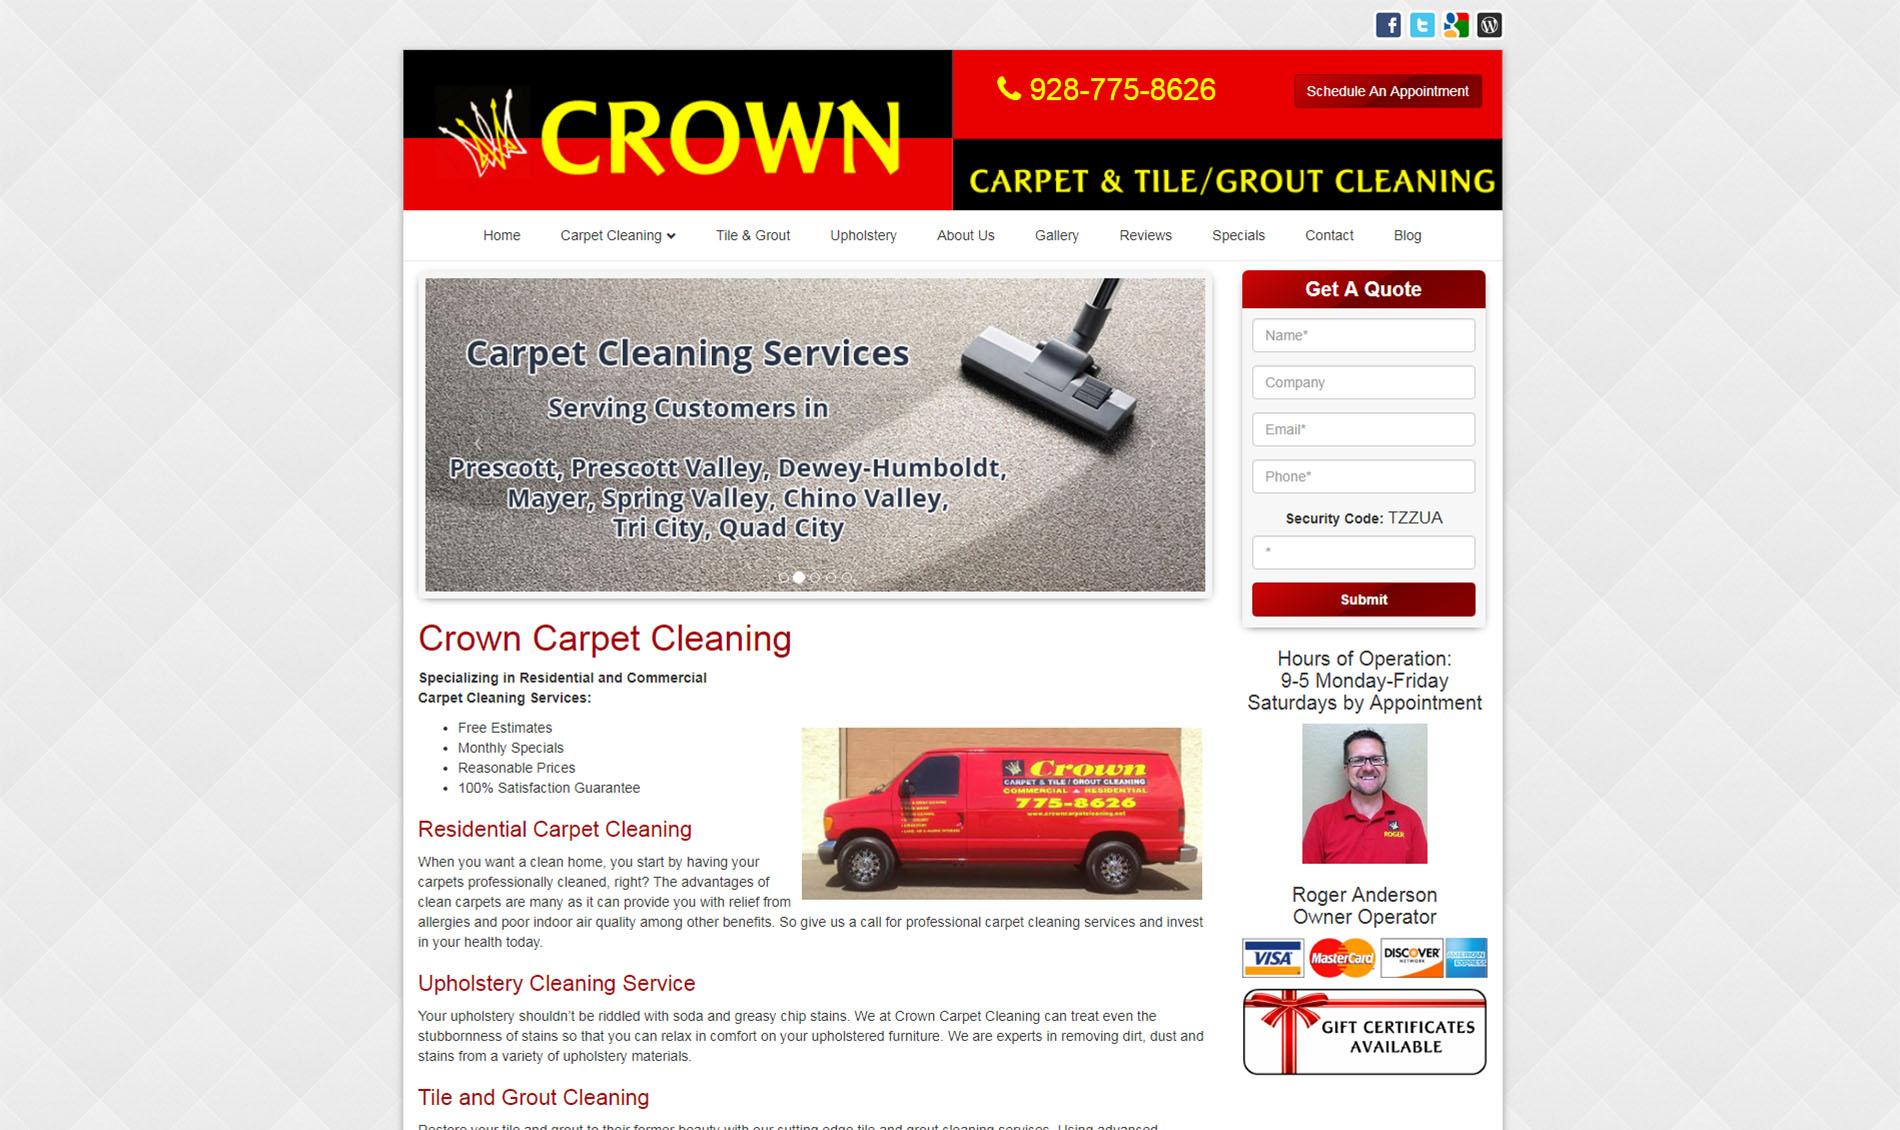 http://www.crowncarpetcleaning.net/